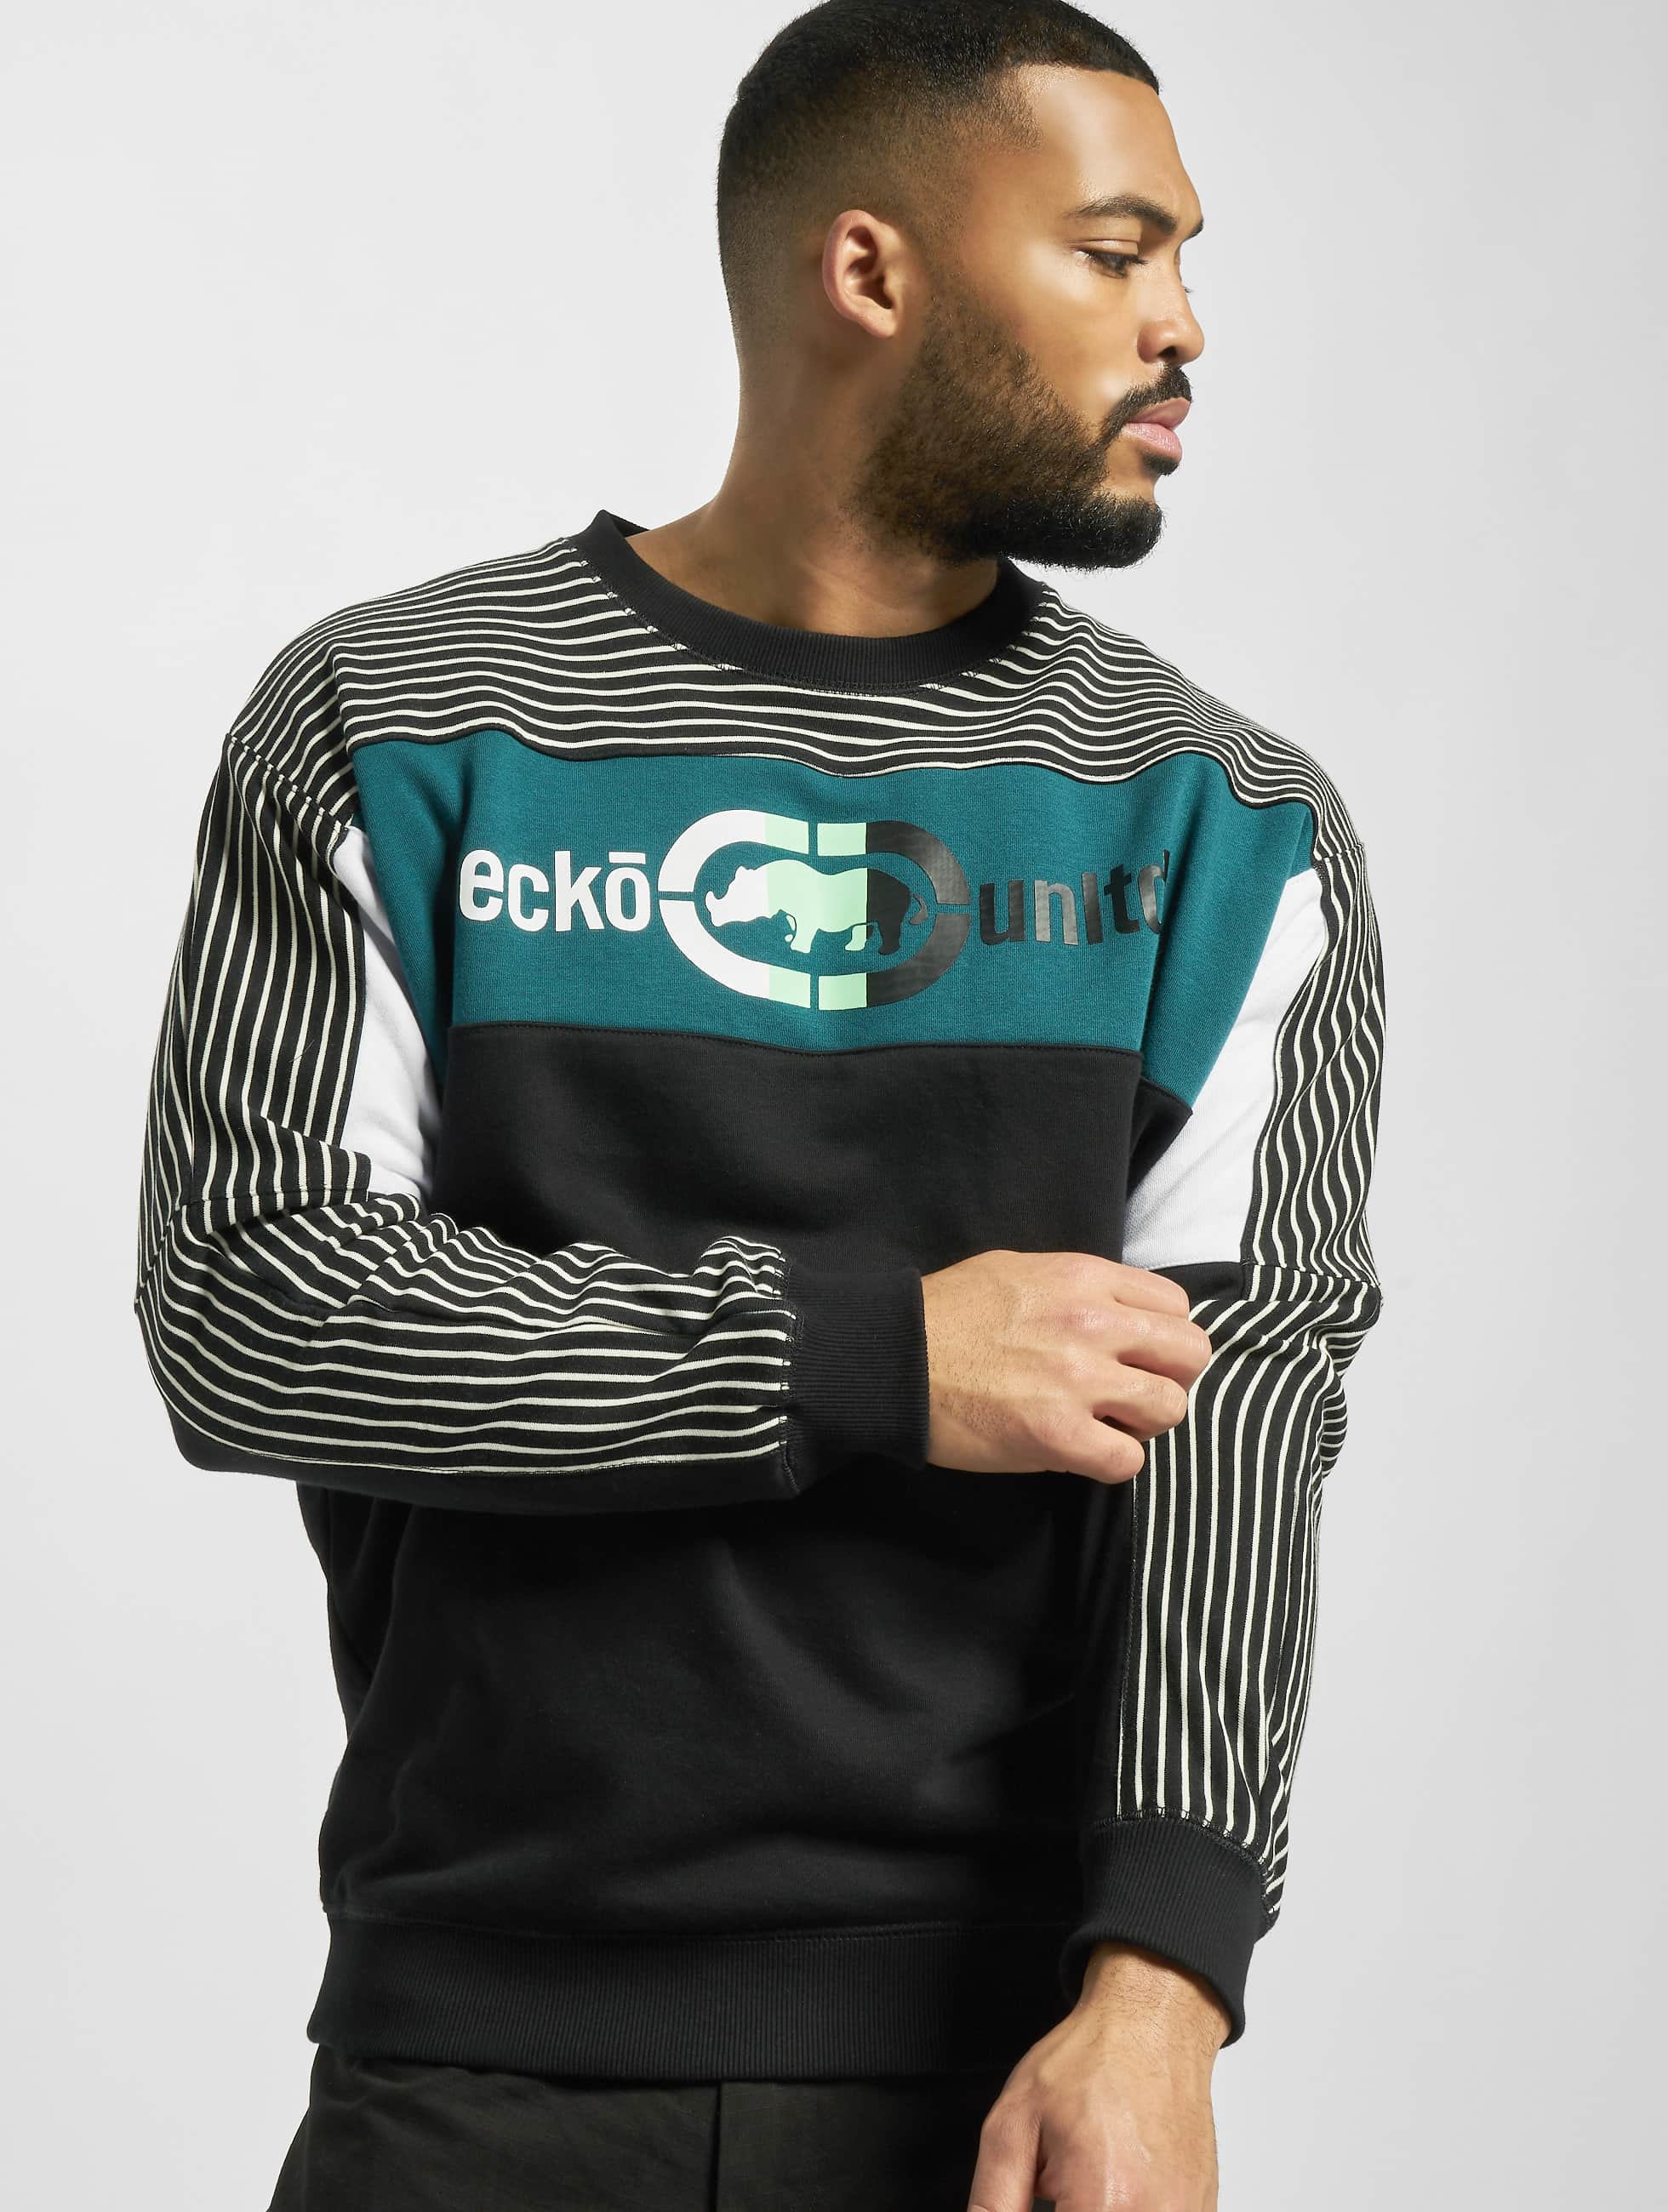 Ecko Unltd. bovenstuk trui Richard in zwart 741432